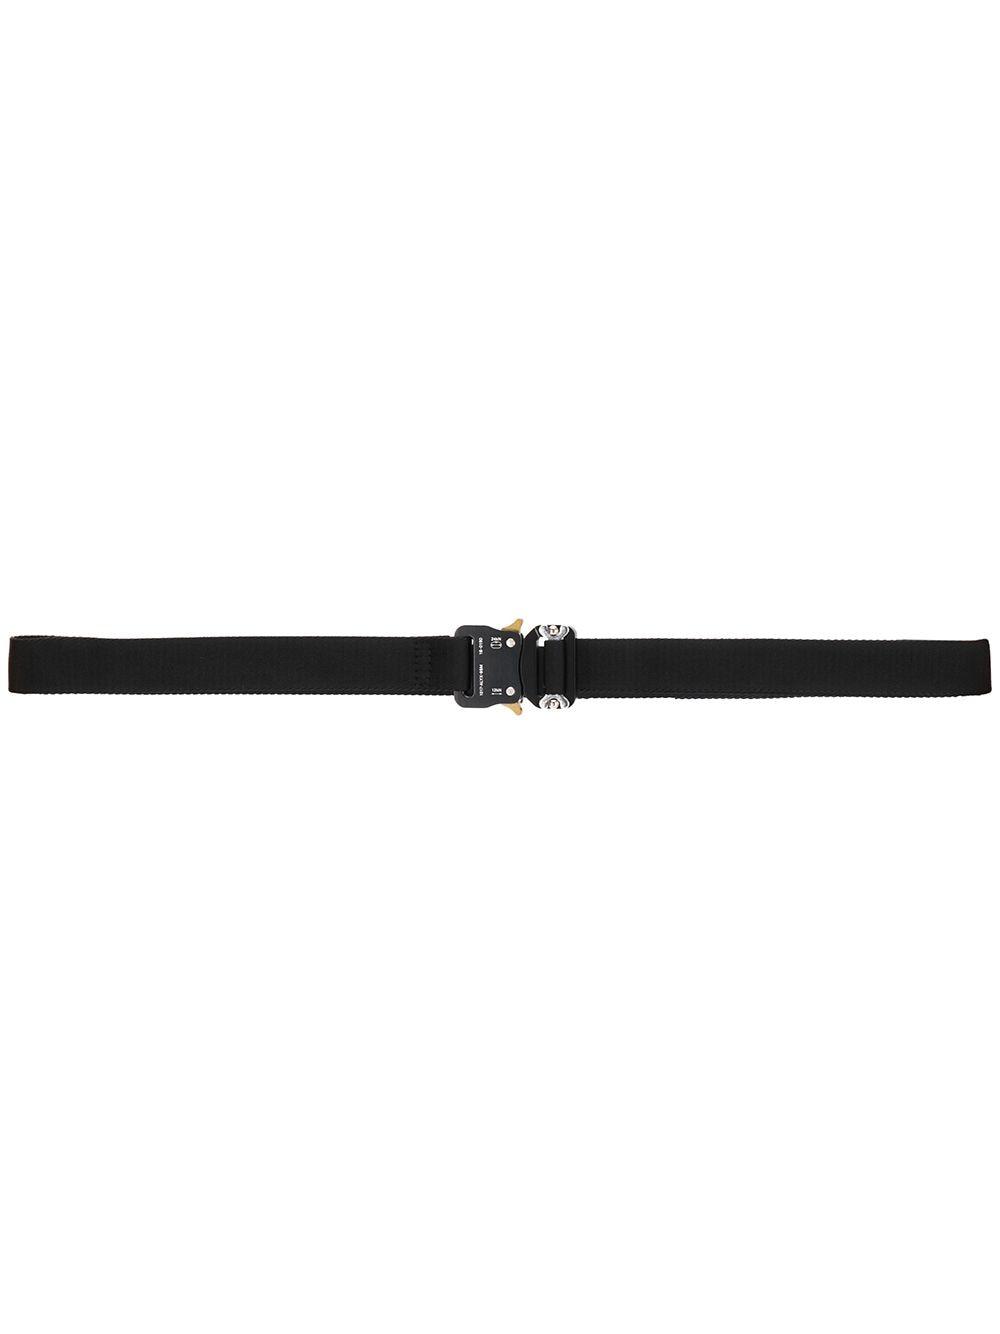 Medium rollercoaster belt Black Man 1017 ALYX 9SM | Belts | AAUBT0002FA01BLK0001